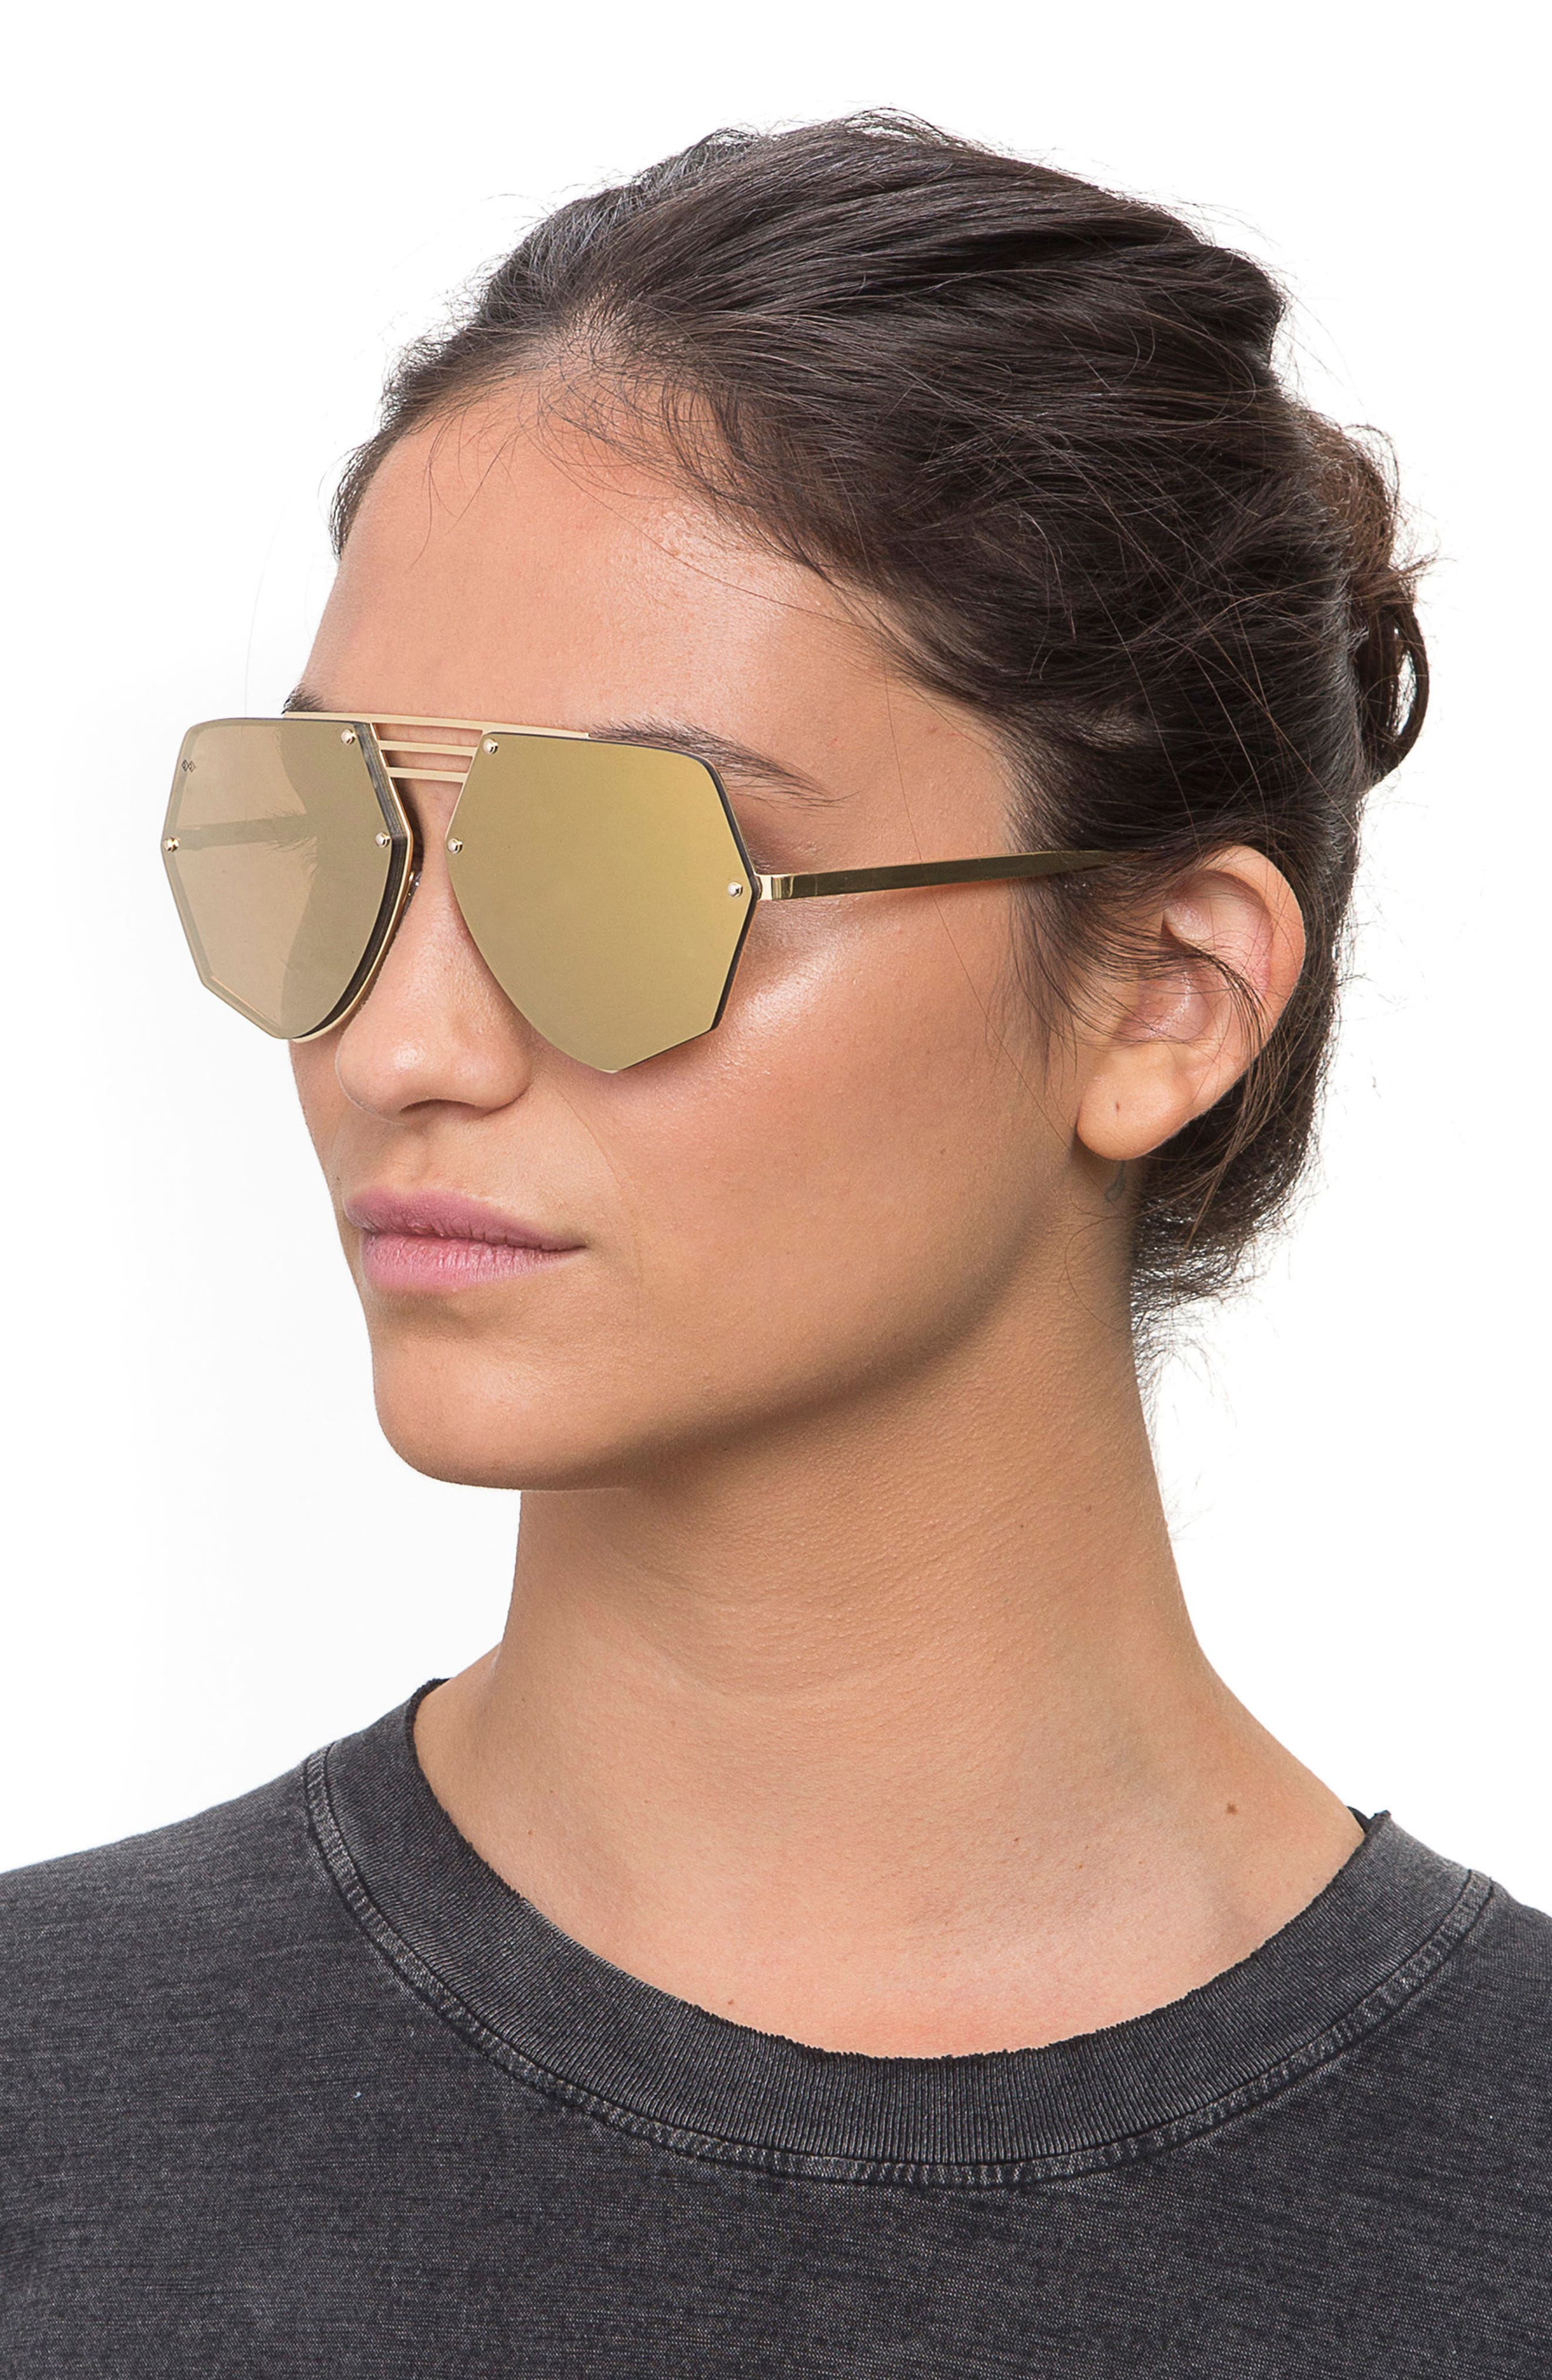 Geo 8 60mm Sunglasses,                             Alternate thumbnail 2, color,                             Gold/ Gold Mirror